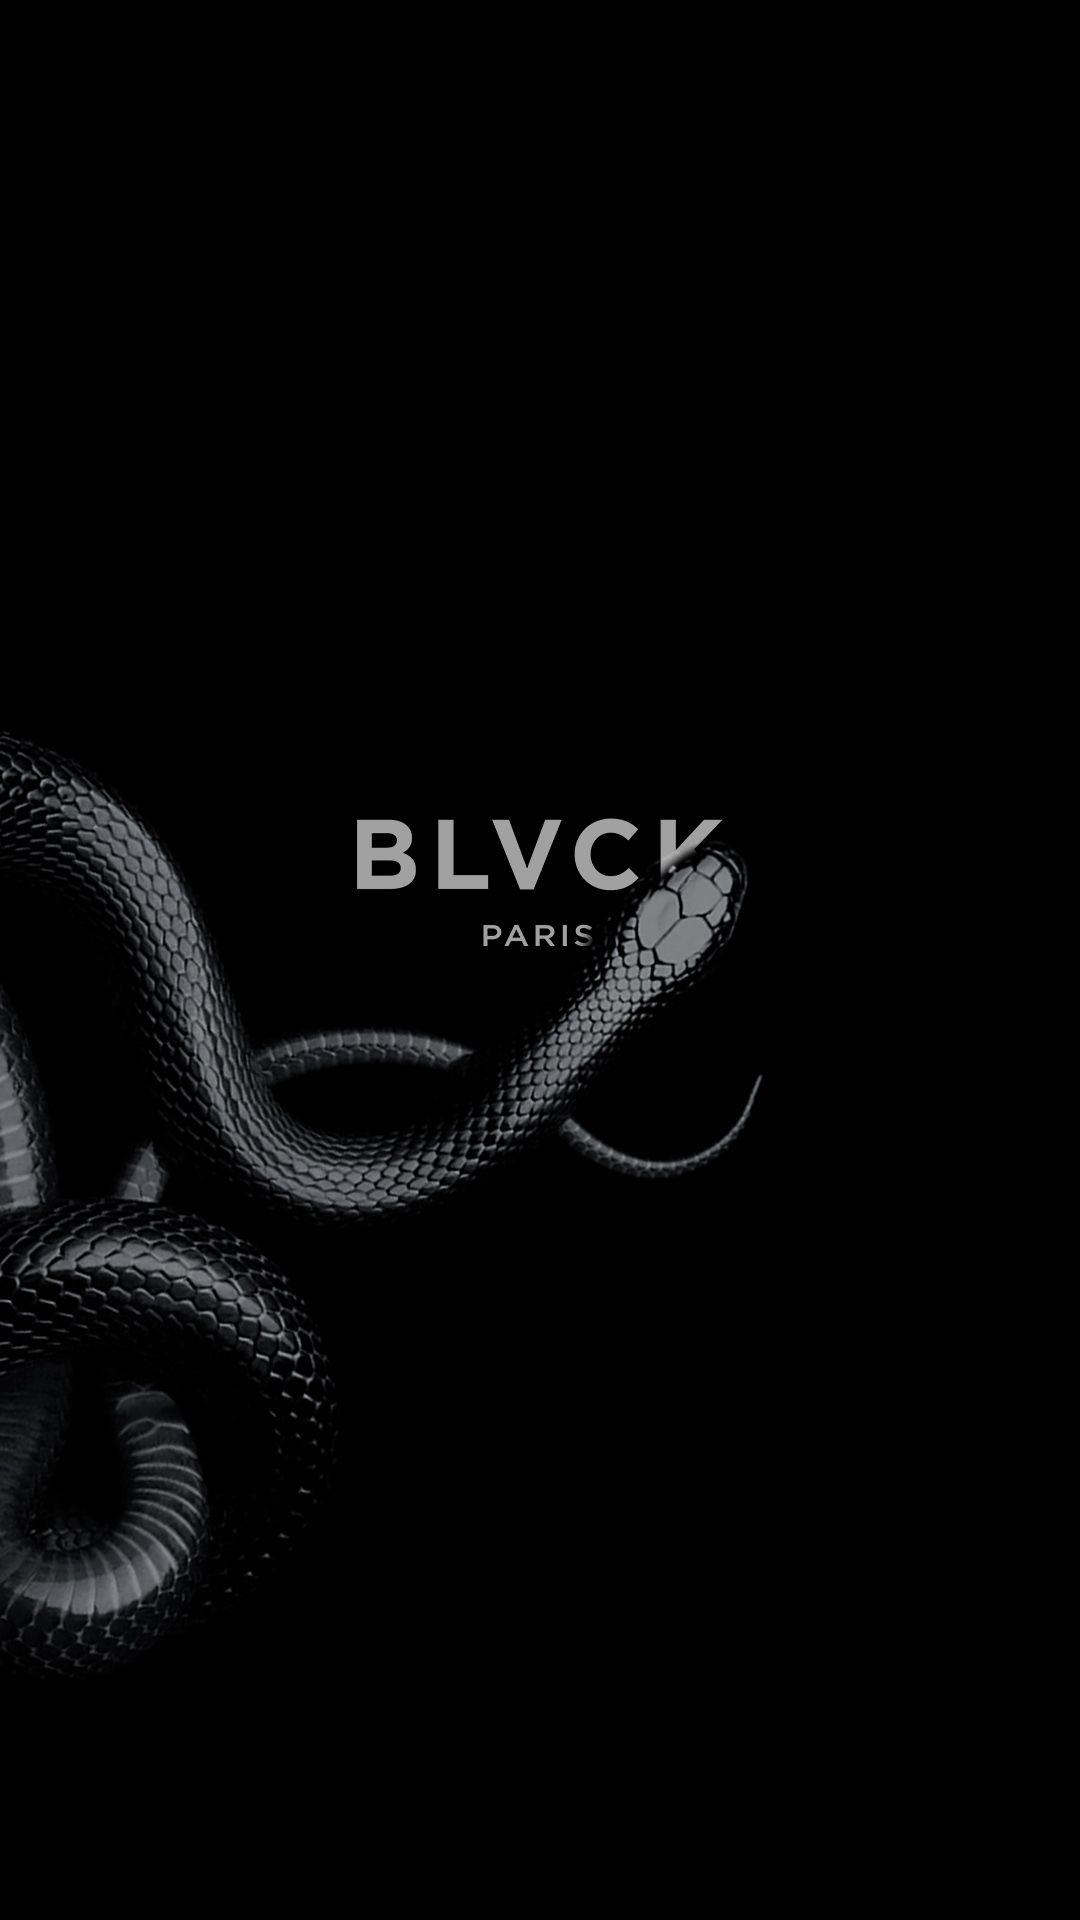 Pin On Wallpapers Iphone black mamba snake wallpaper hd